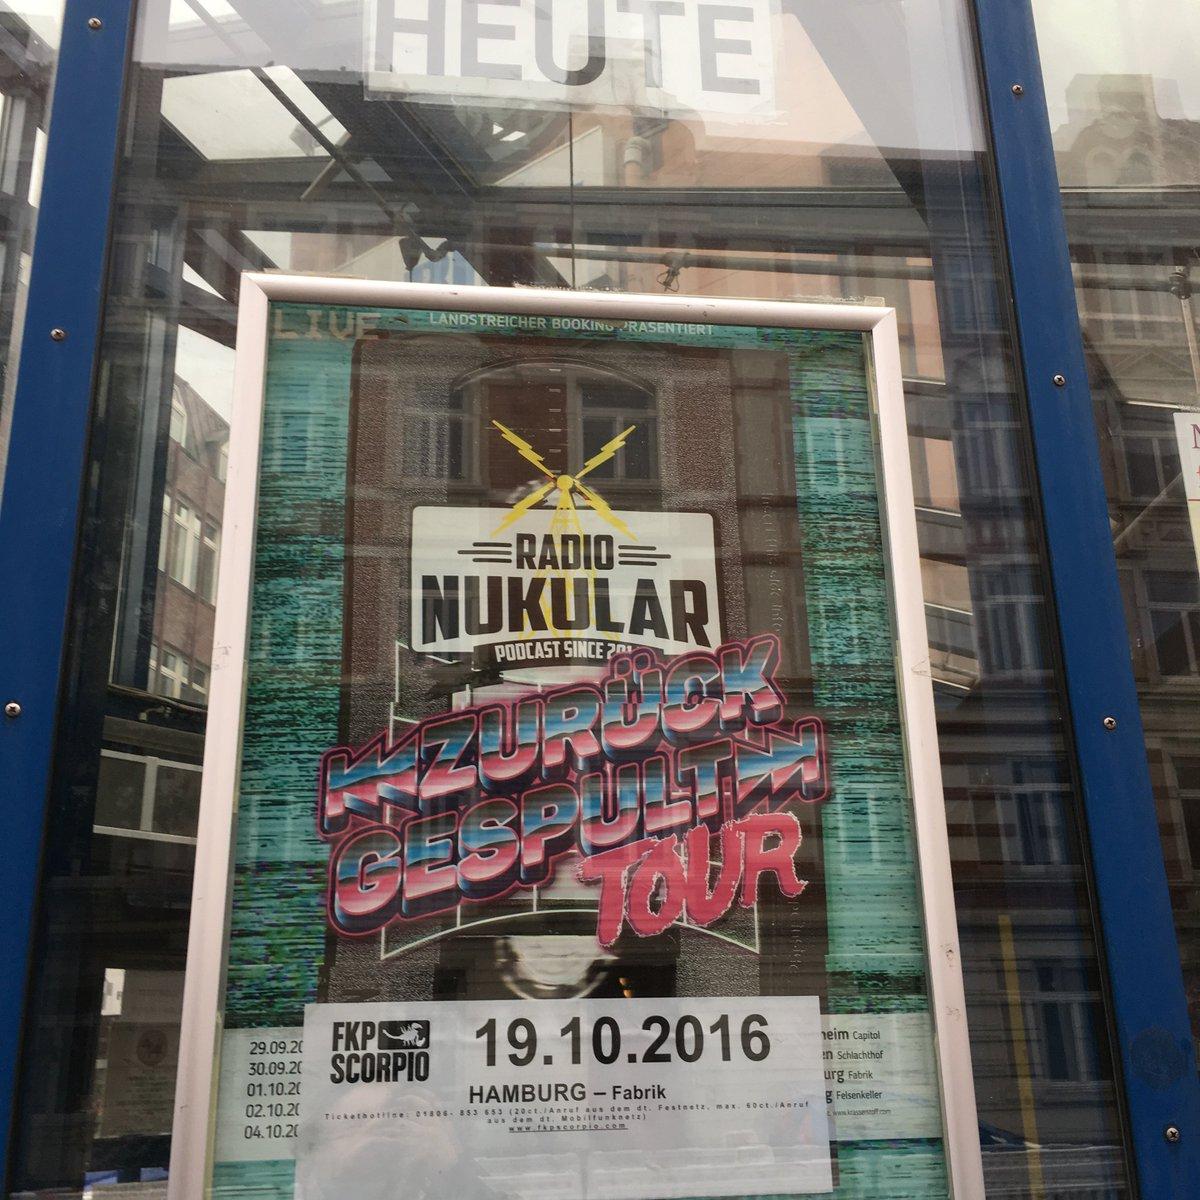 Radio Nukular On Twitter Hallo Hamburg Ihr Seht Gut Aus Beim